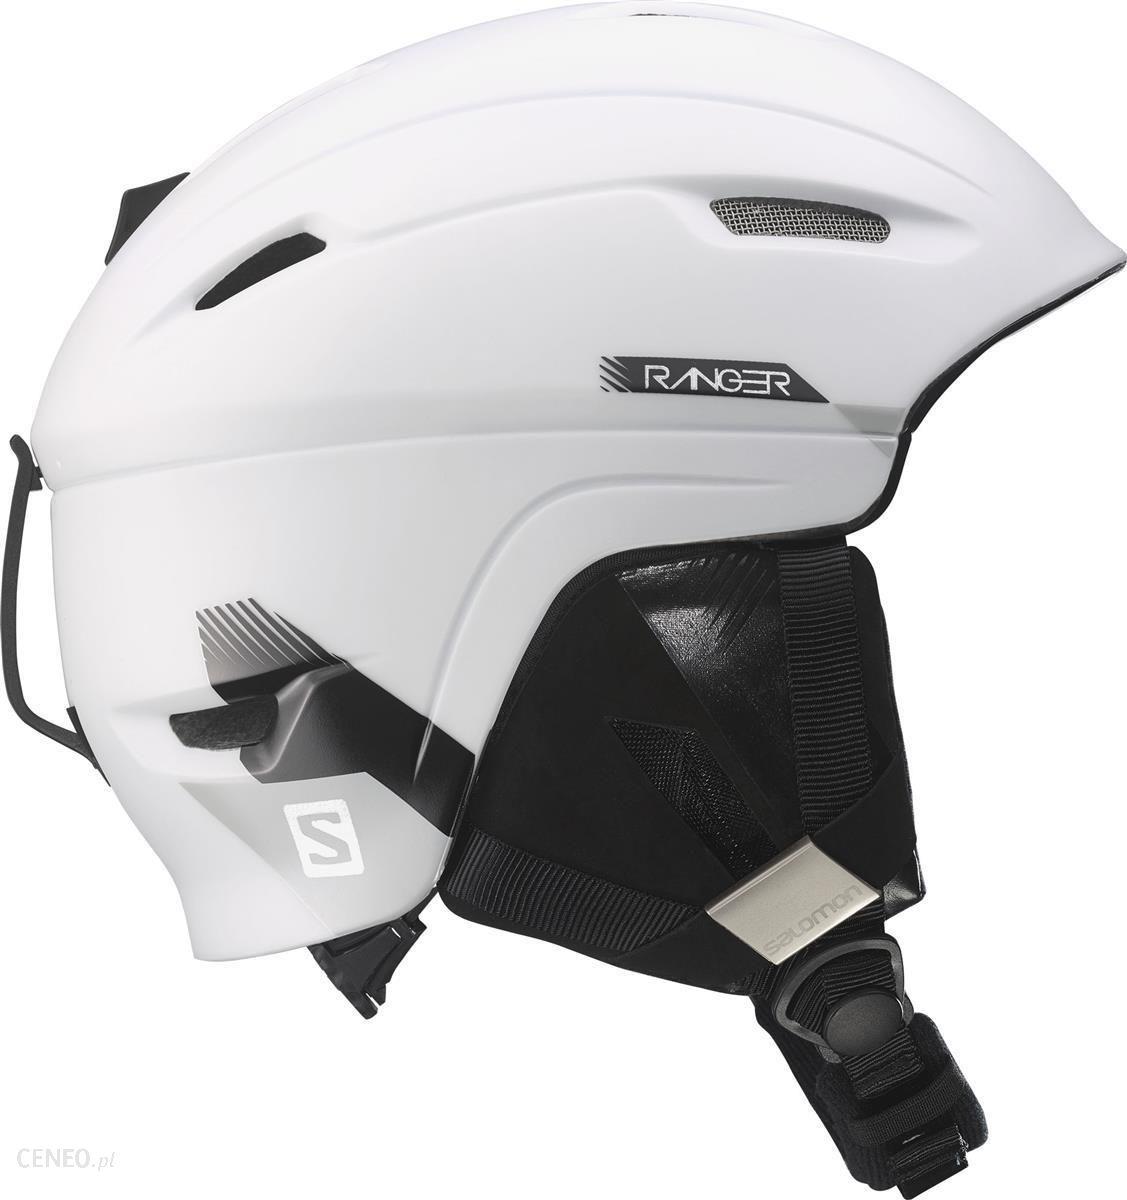 Salomon Ranger 4D Biały